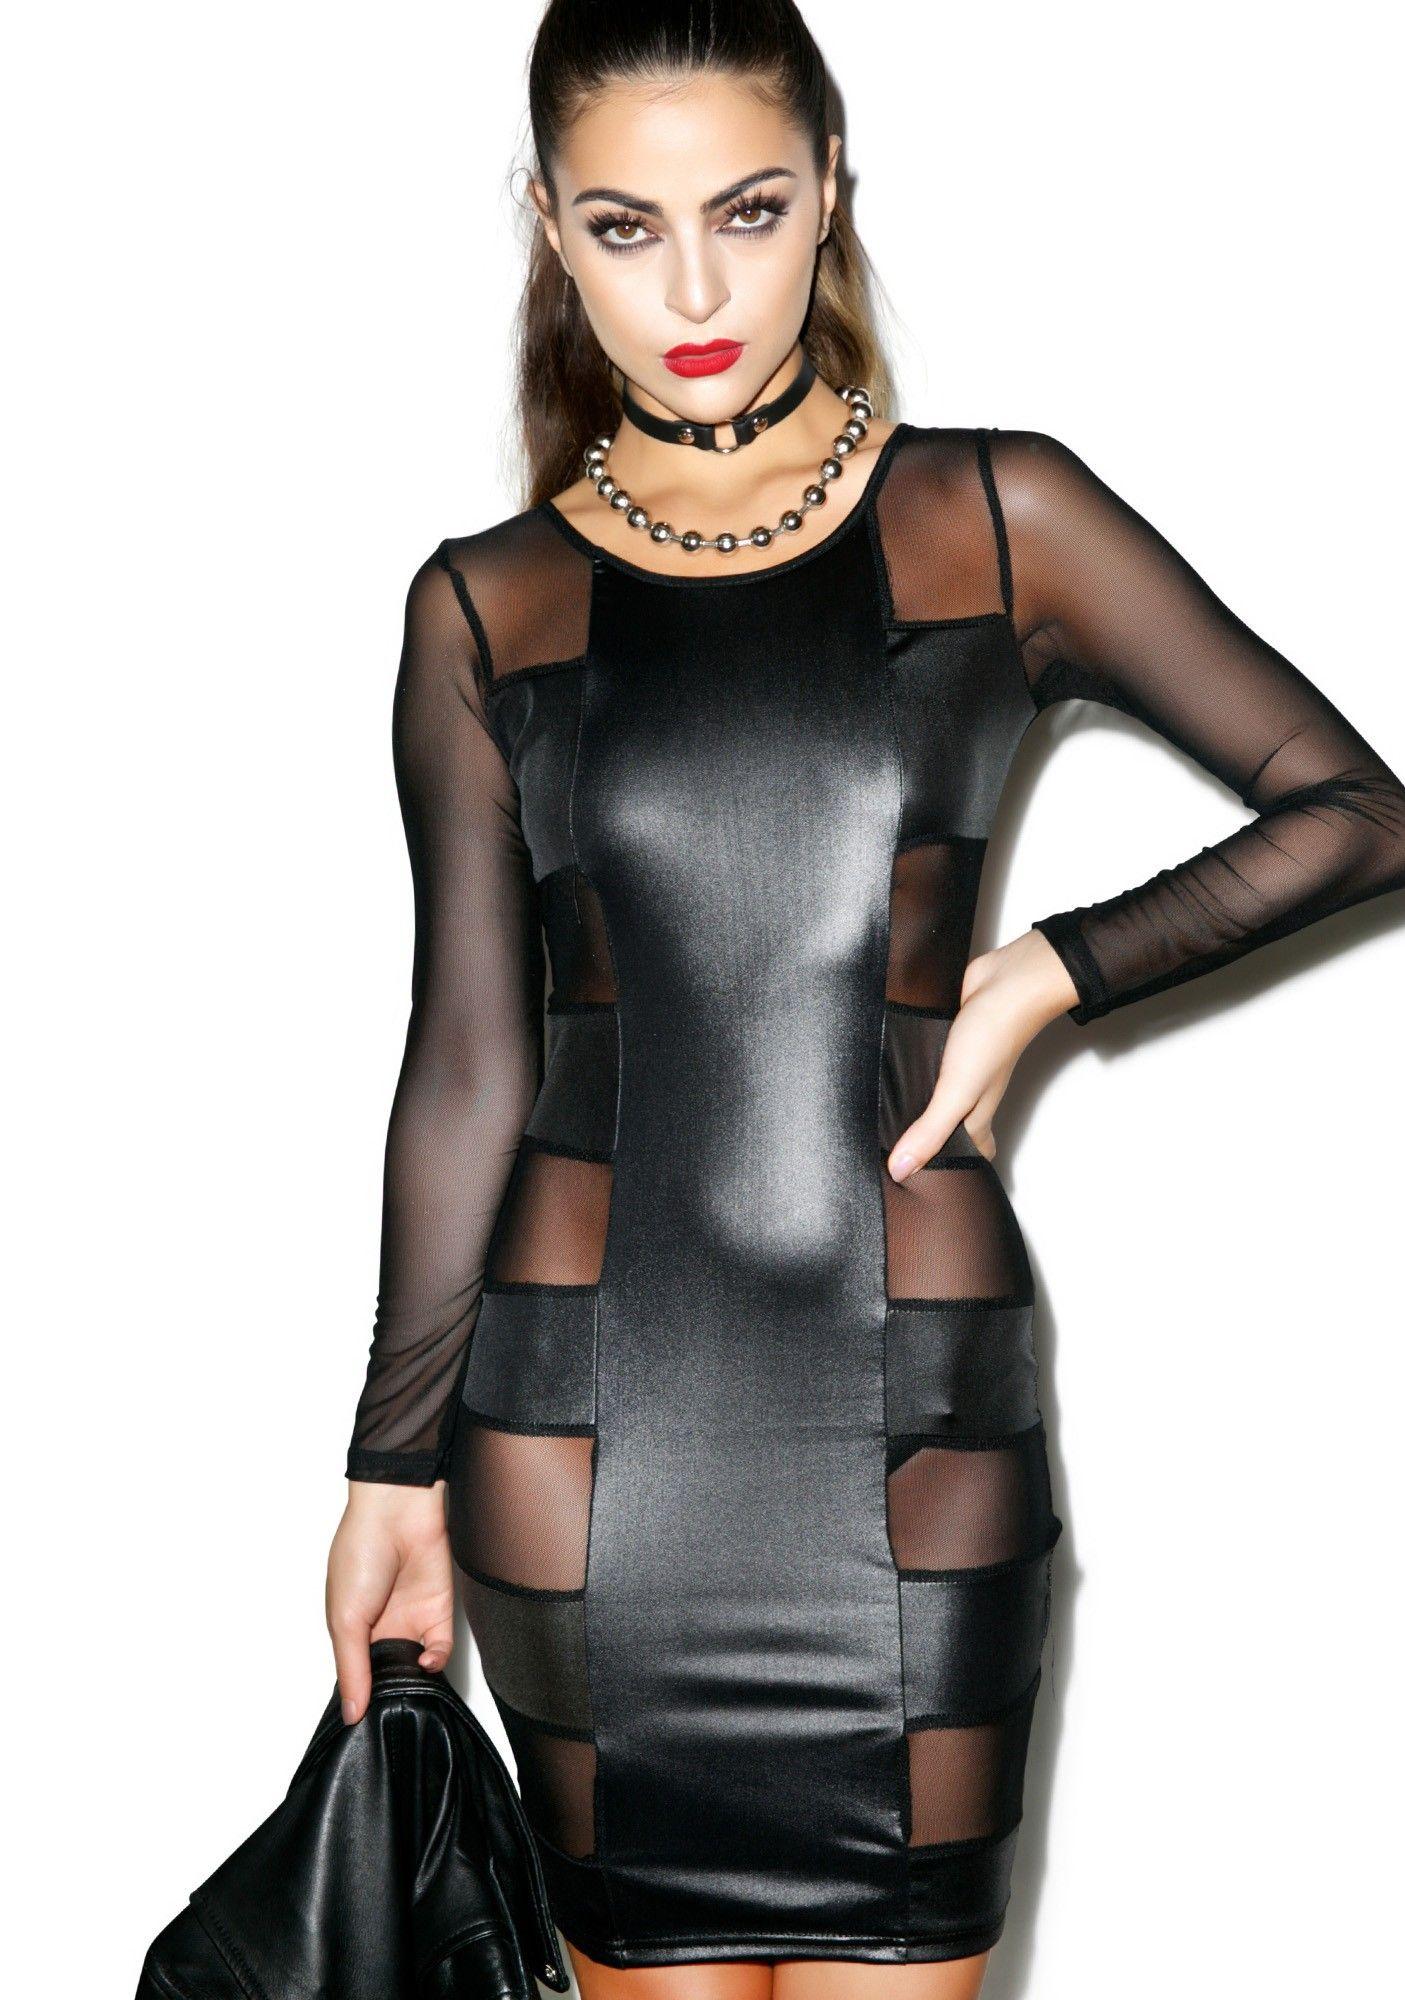 Holly Halston Latex within mistress of matrix dress | latex, streetwear clothing and clubwear